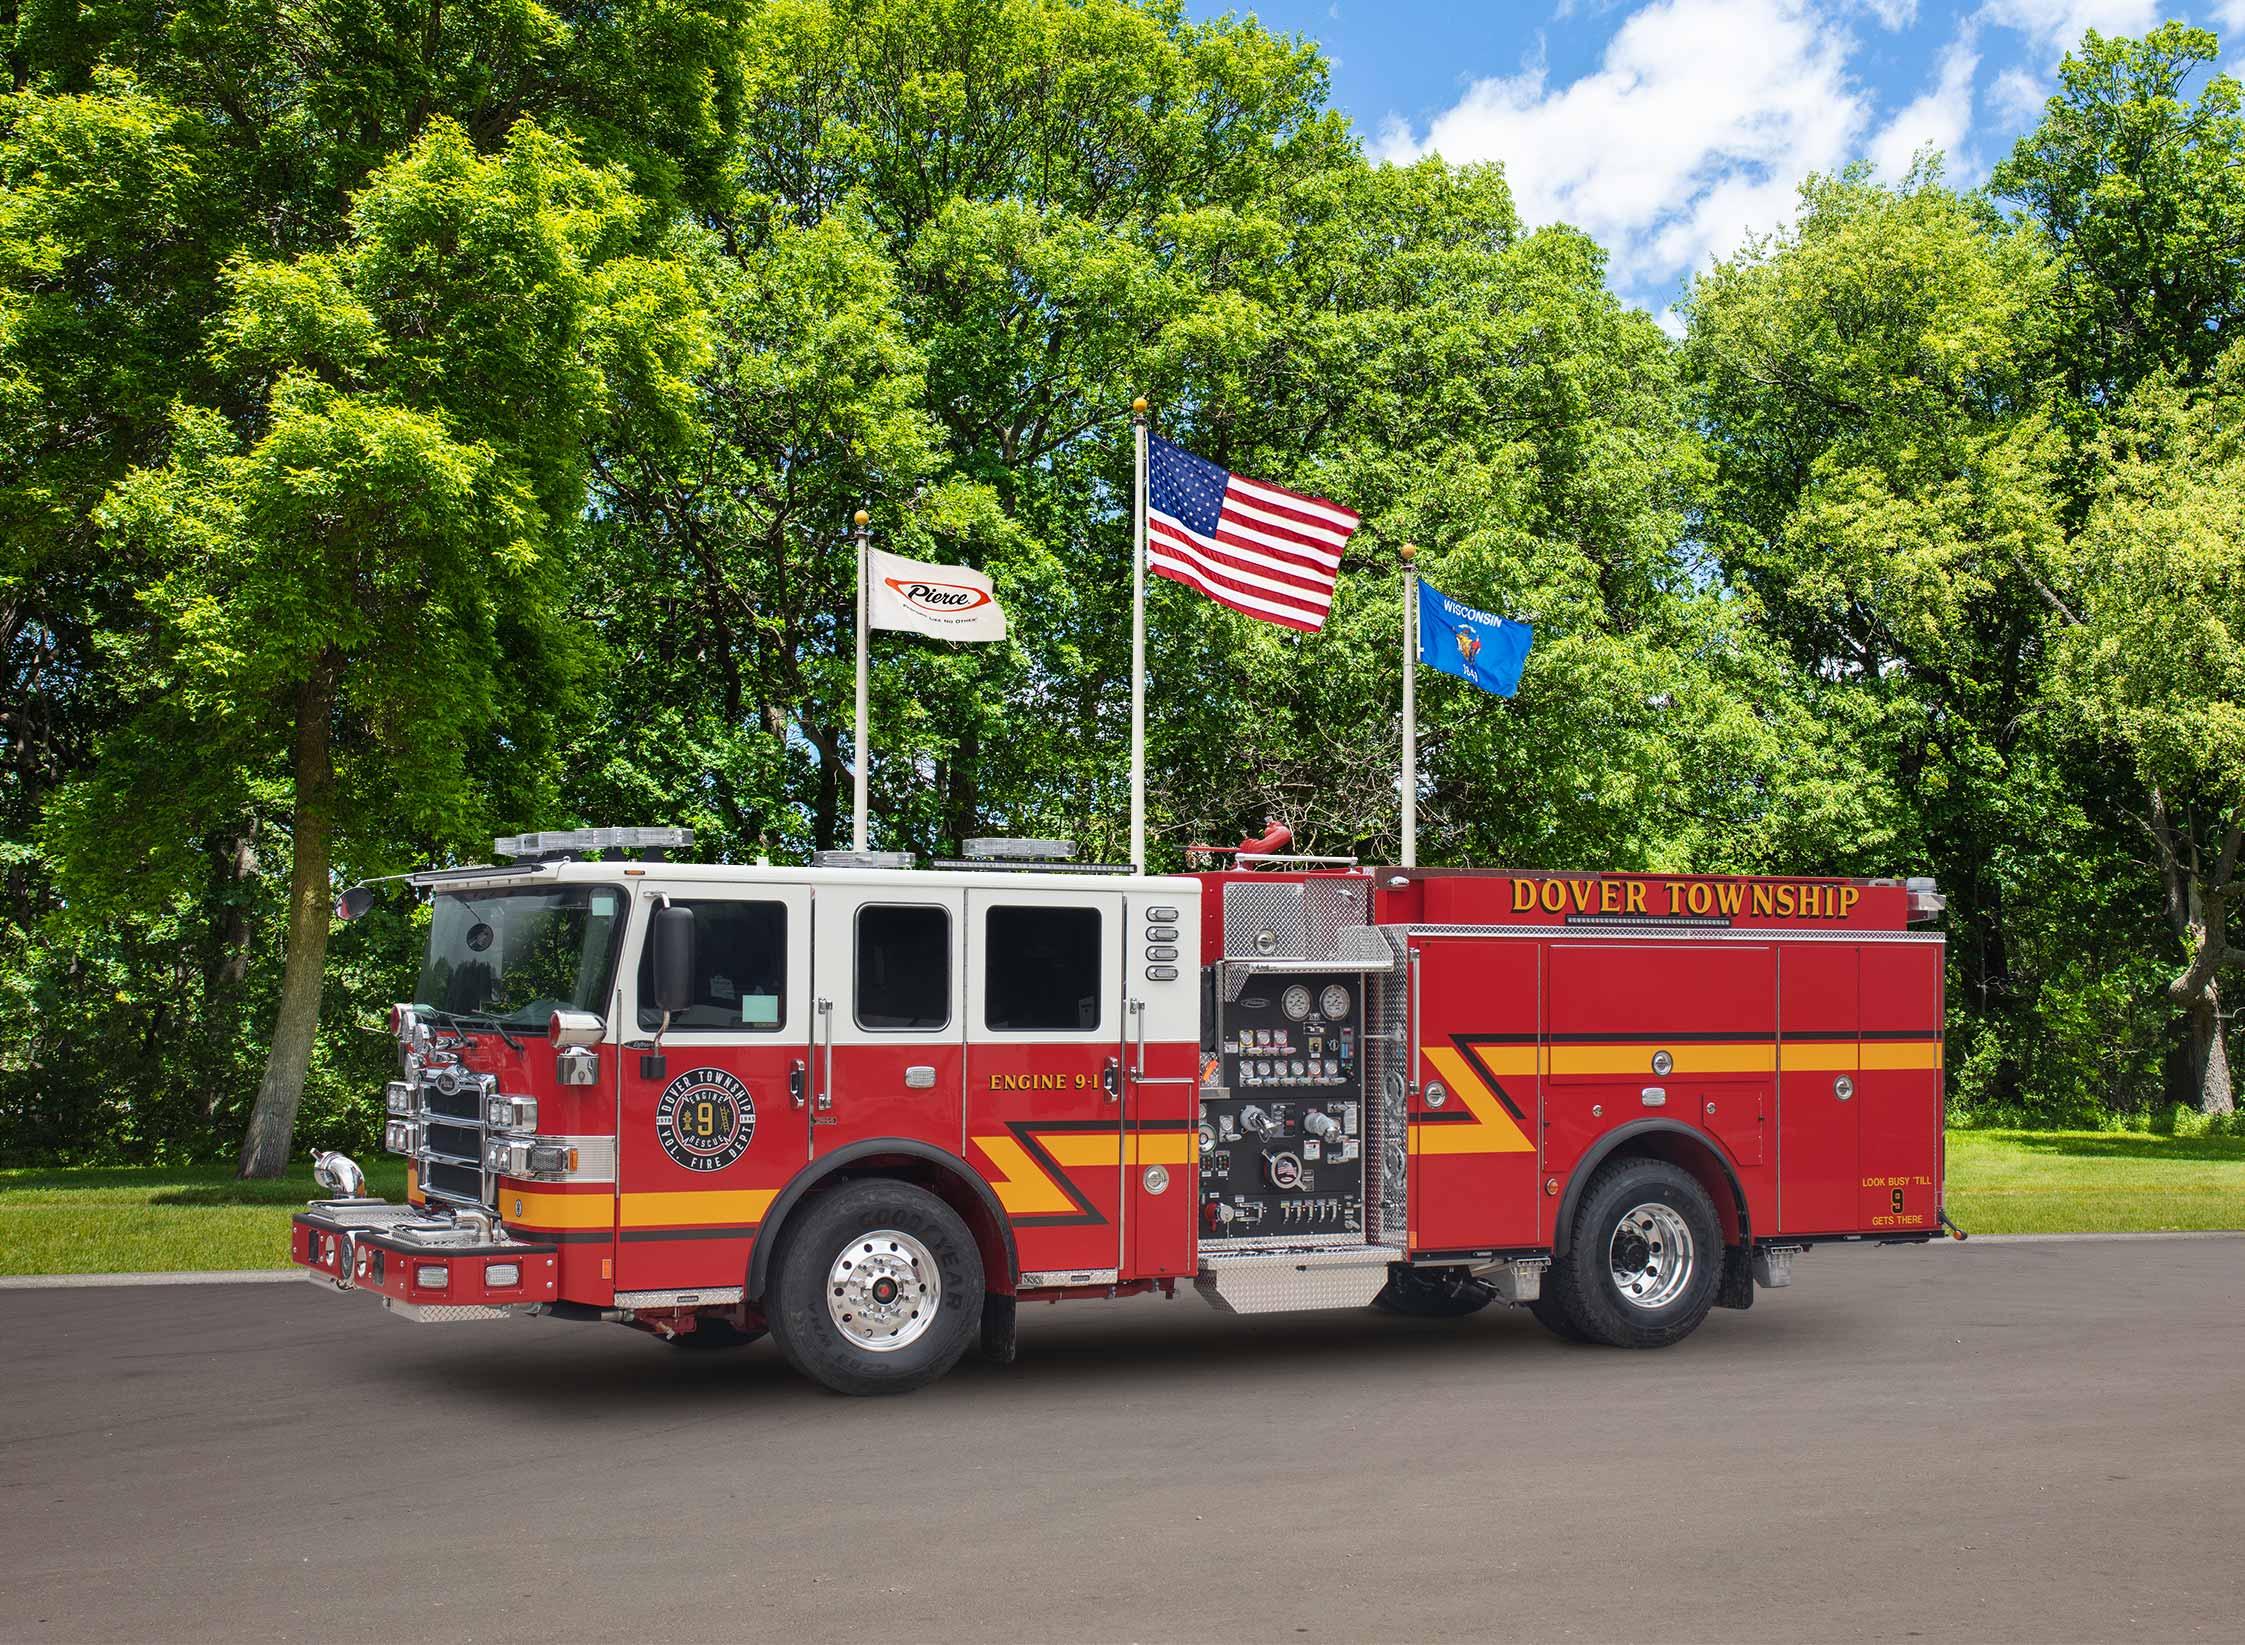 Dover Township Fire Department - Pumper